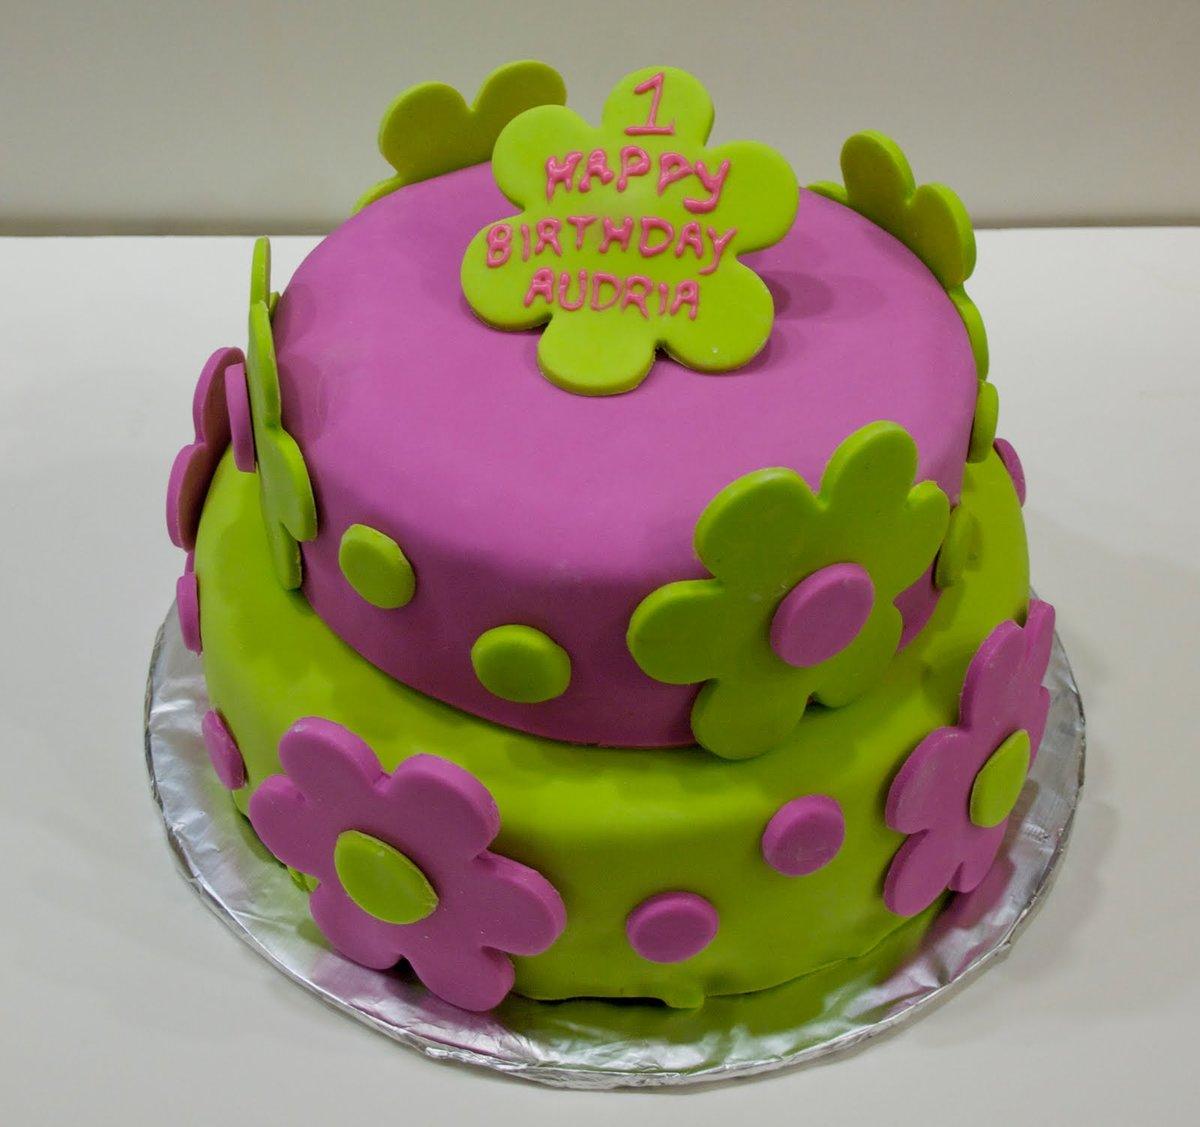 торт з мастики на день народження фото нашей